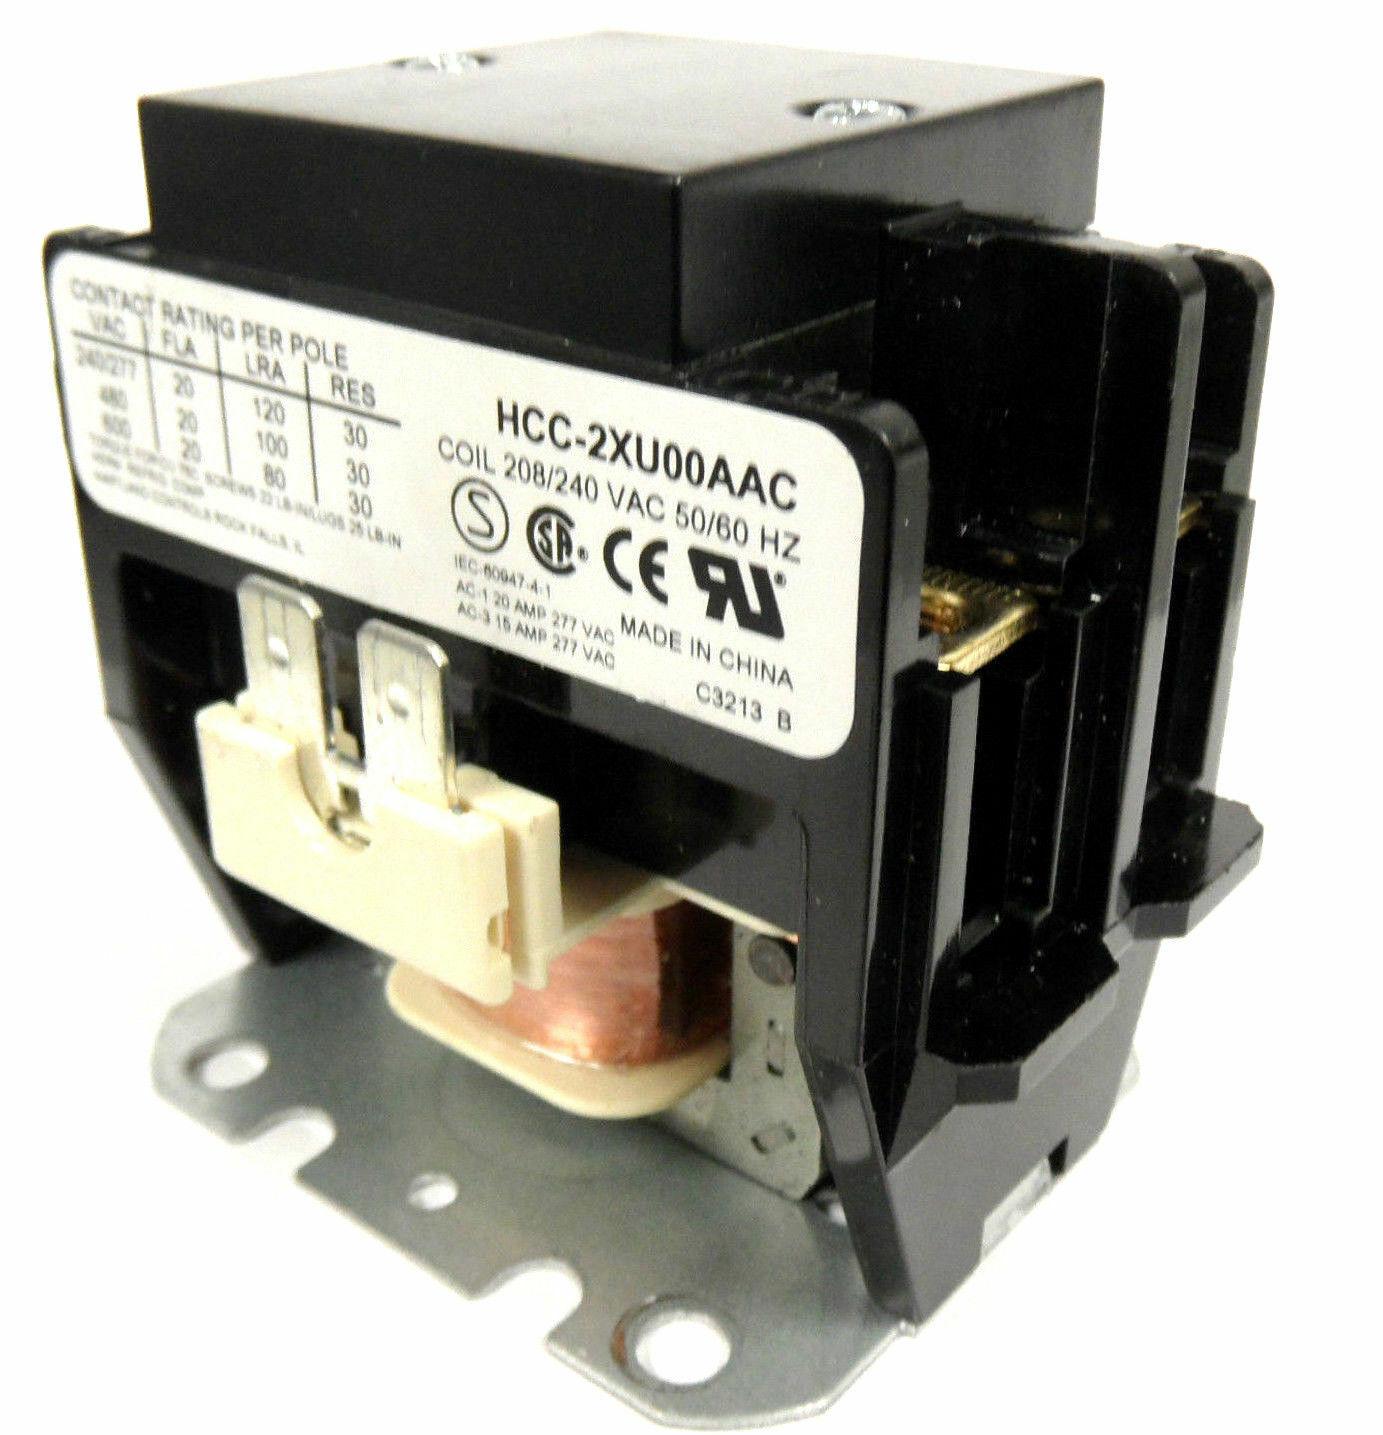 Allied Innovations Hcc-2xu00aac Auftragnehmer Ap-1400 208 240vac 50 60hz